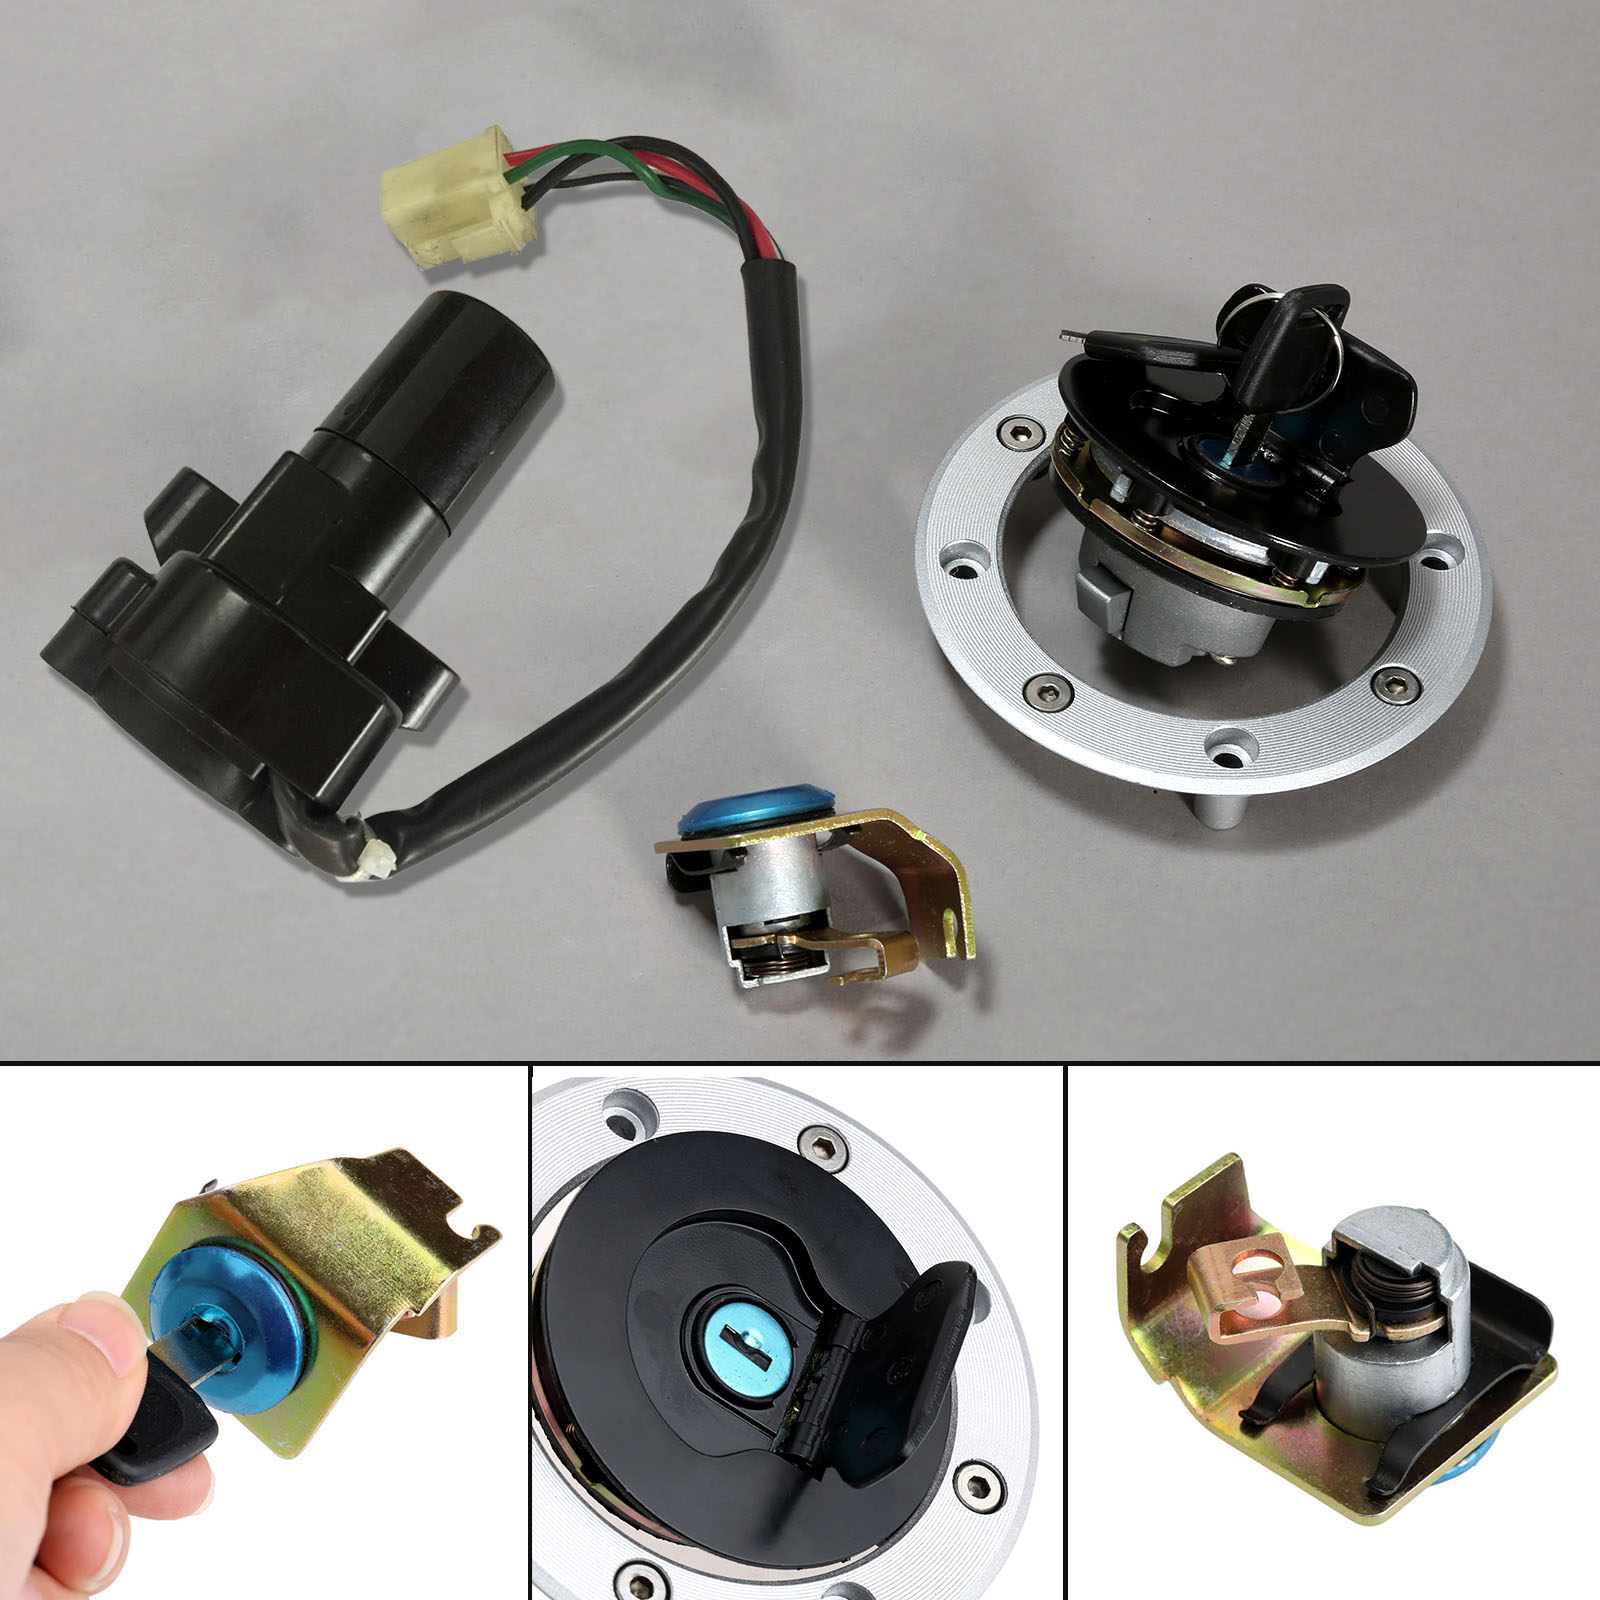 aluminio moto ignition mudar cap gas combustivel tampa de assento conjunto chave de bloqueio com bloqueio